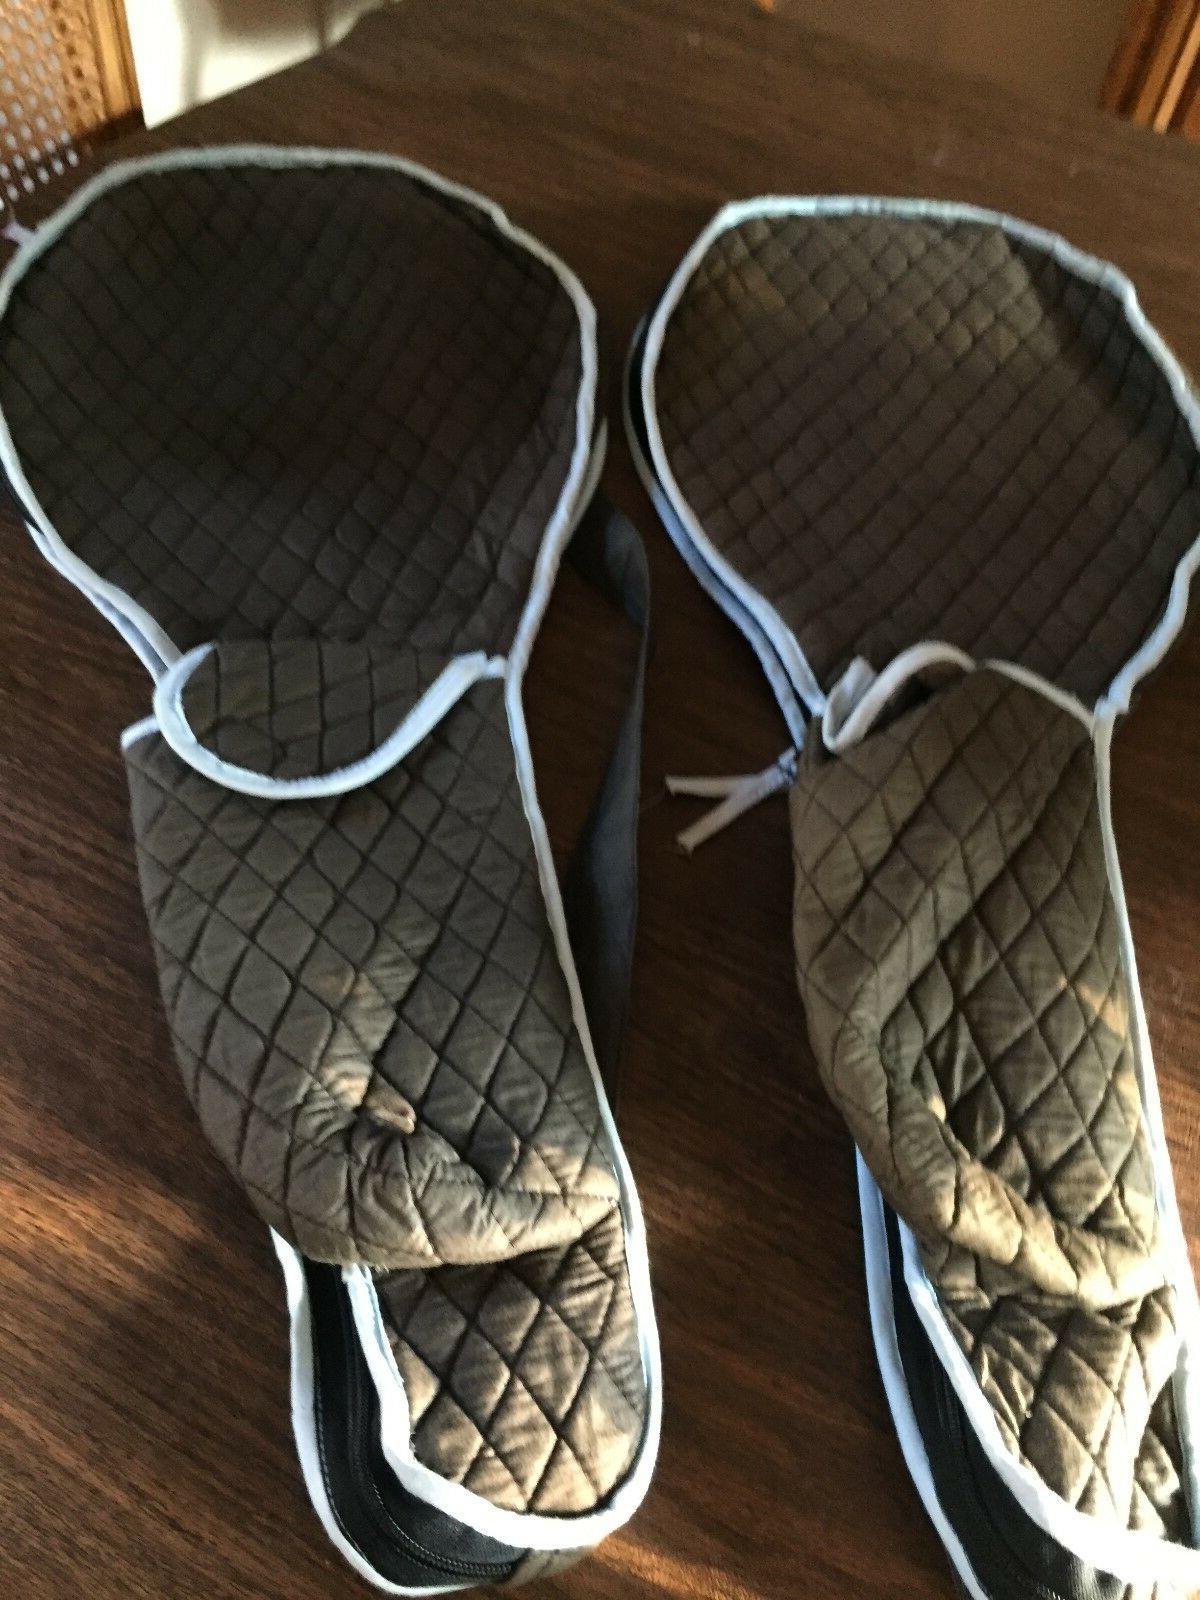 Malabar Bay - Tennis Racket Cases